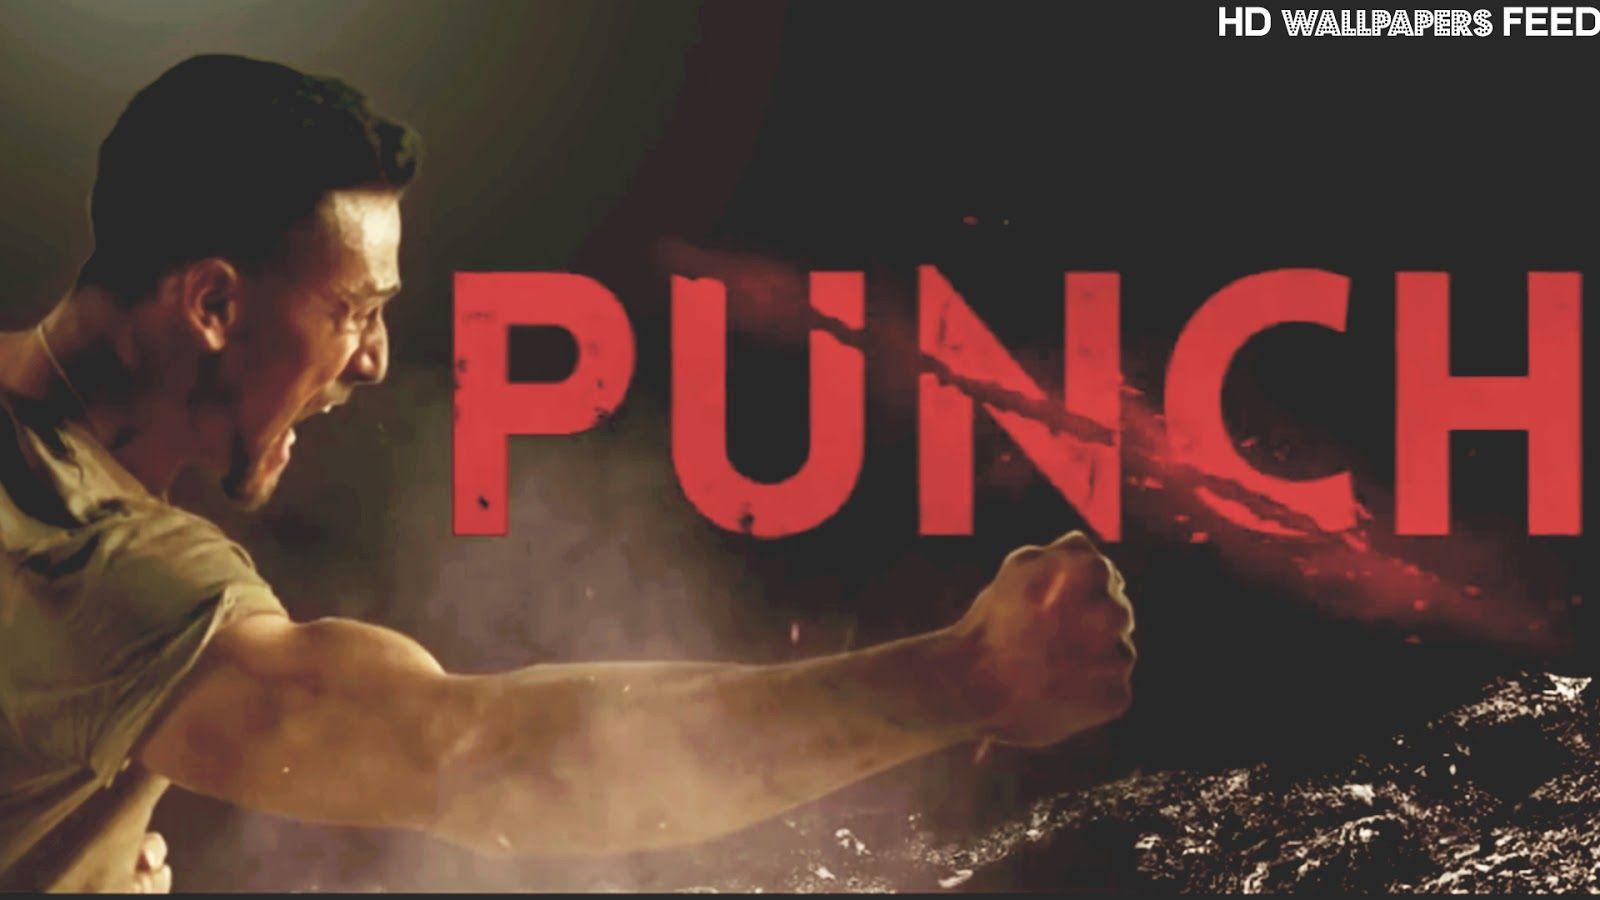 hindi movie hd baaghi 2 free download